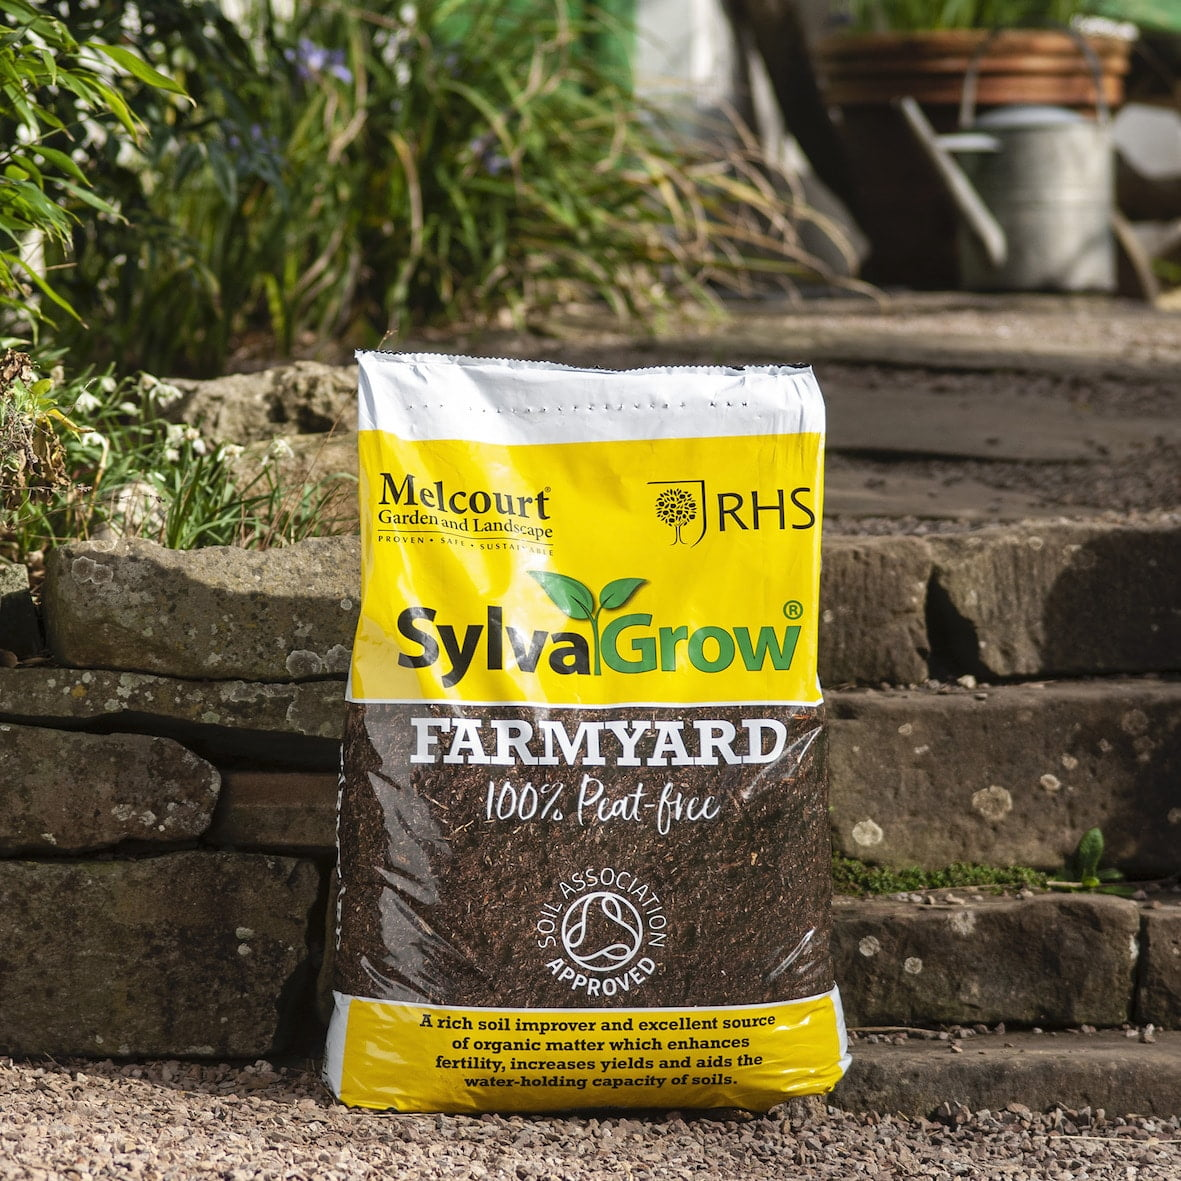 SylvaGrow Farmyard peat free compost